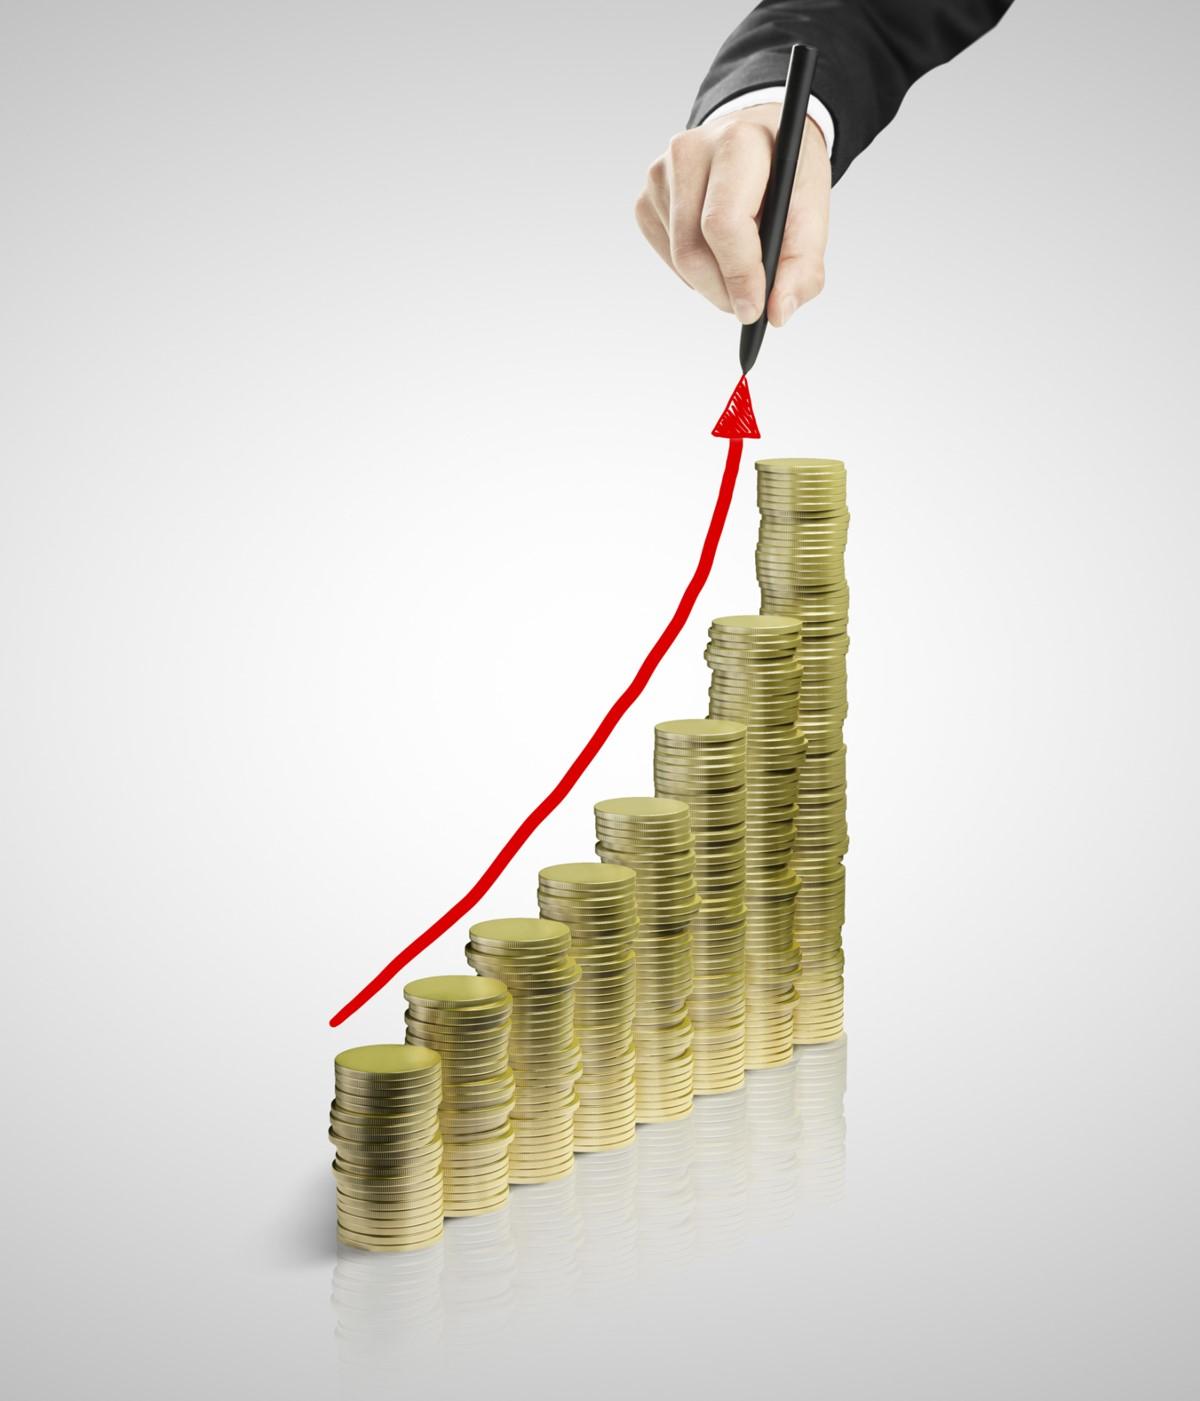 Benefits of Permanent Life Insurance